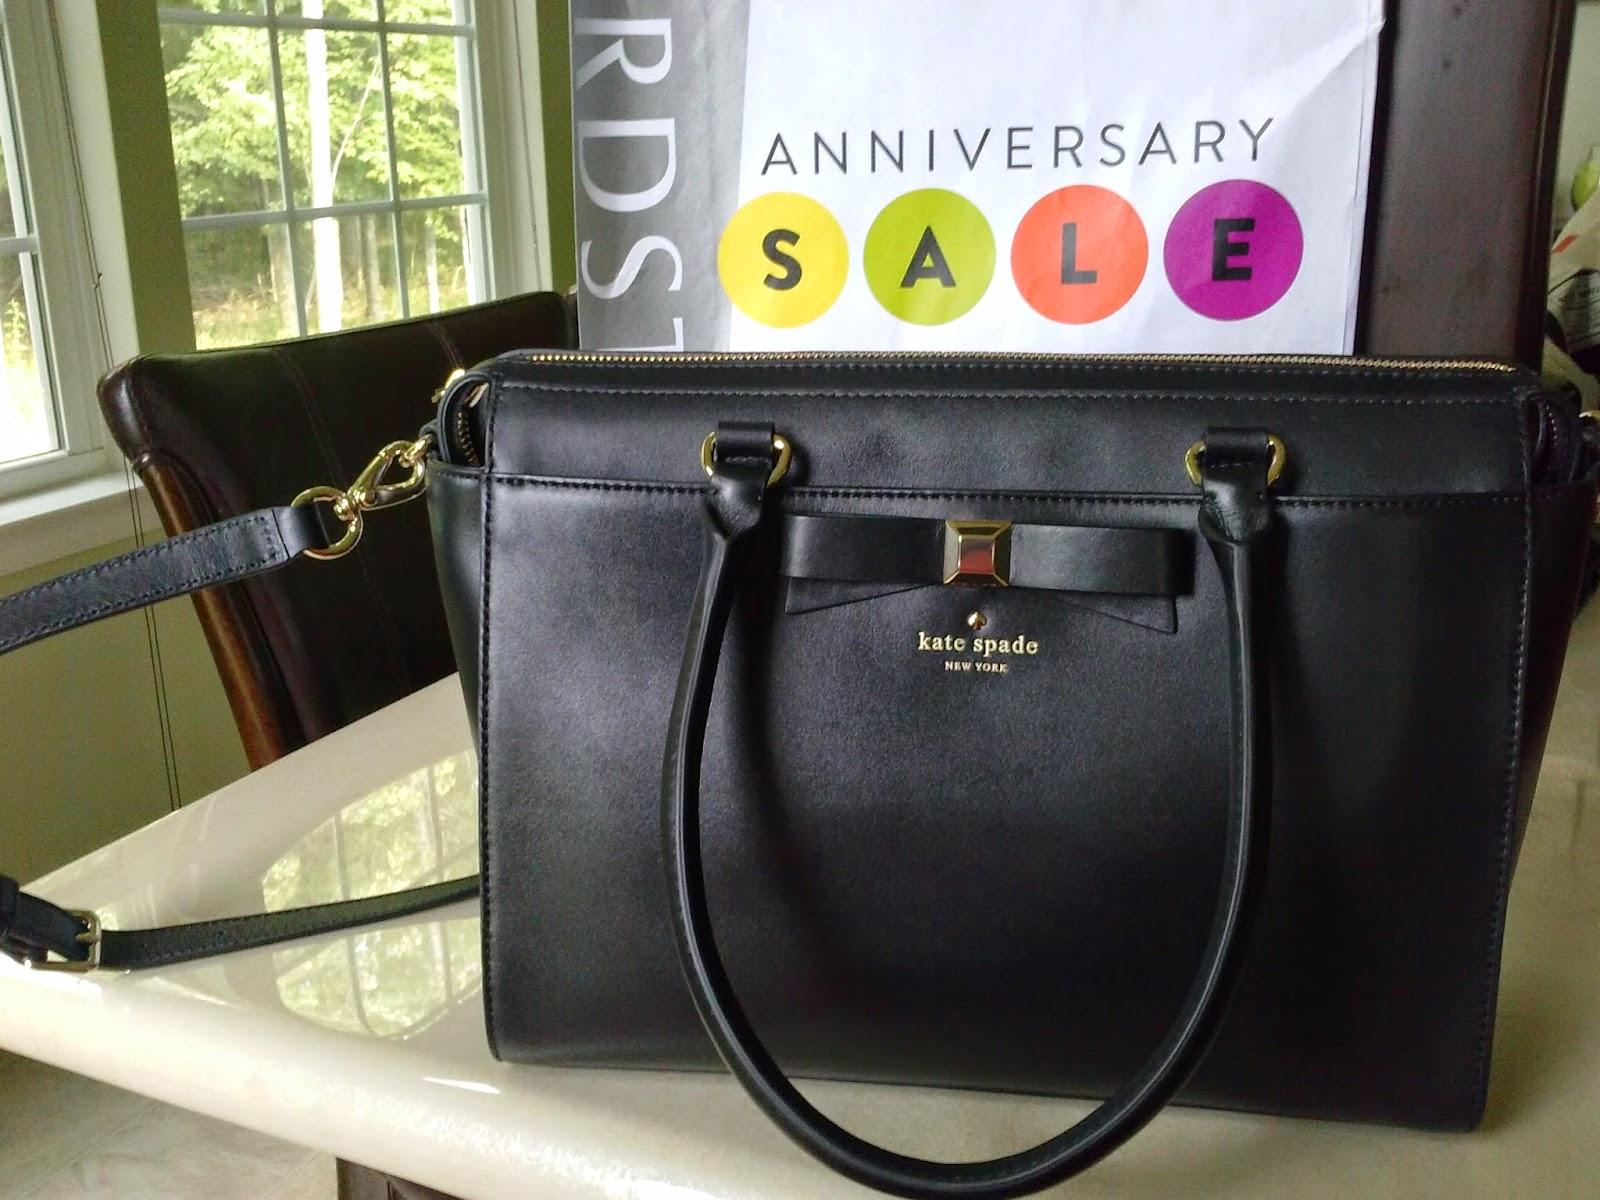 Meet Jeanne My 1st Kate Spade Bag